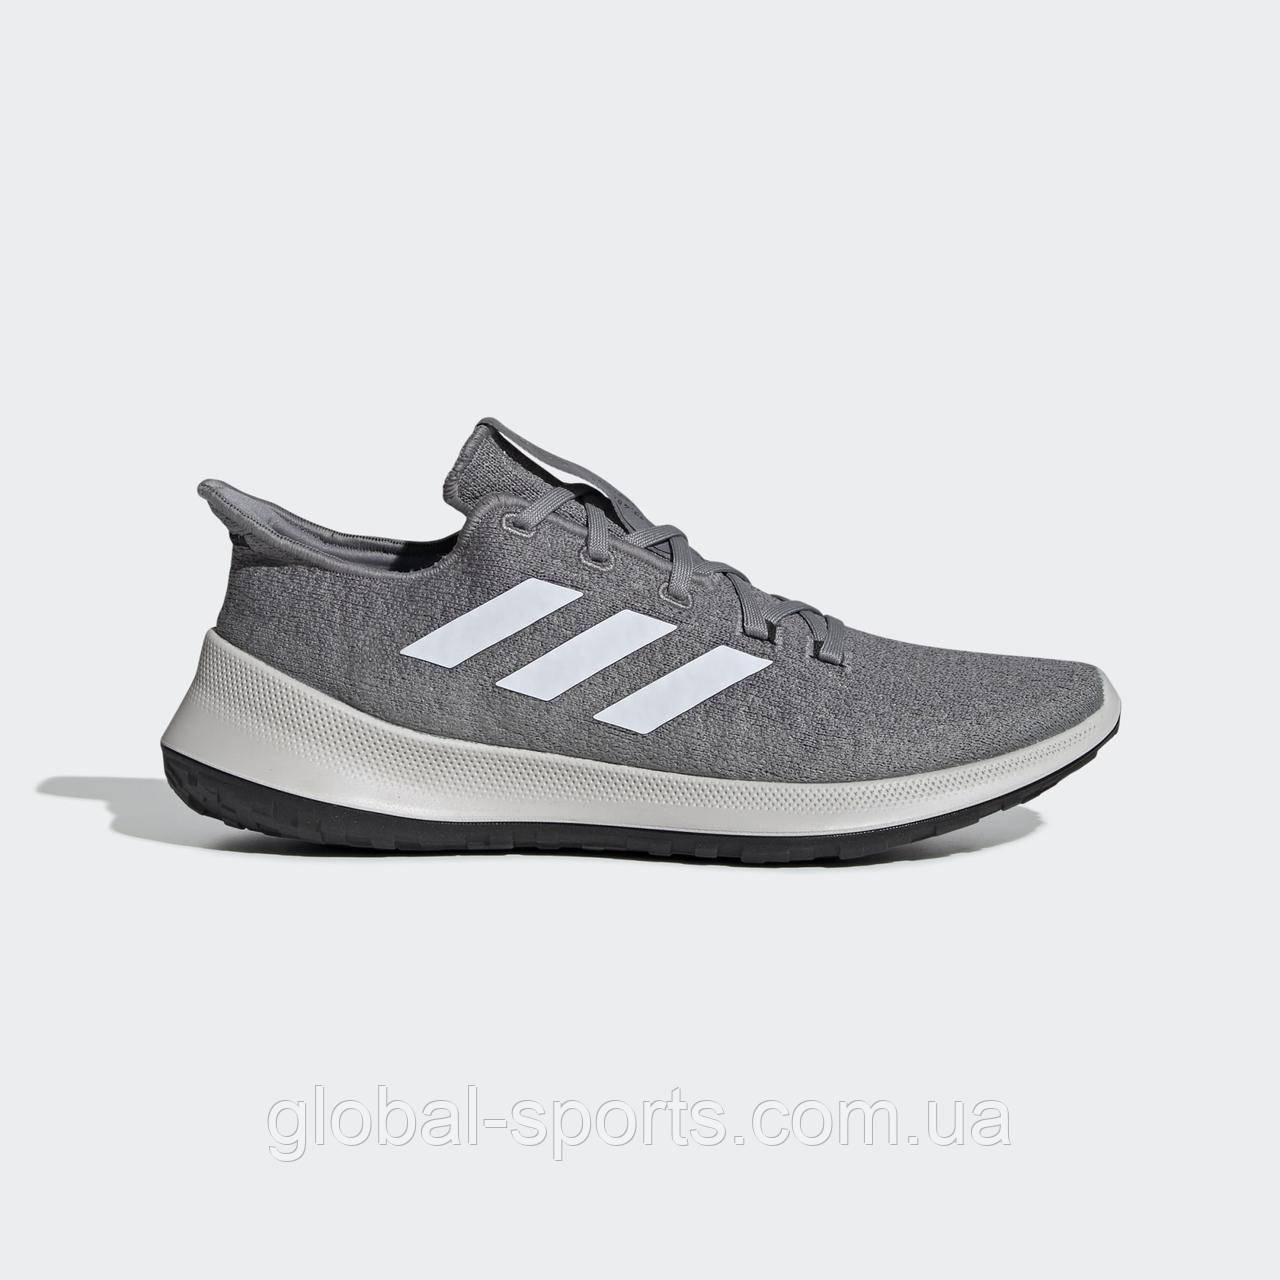 Мужские кроссовки Adidas Purebounce+(Артикул:G27366 )